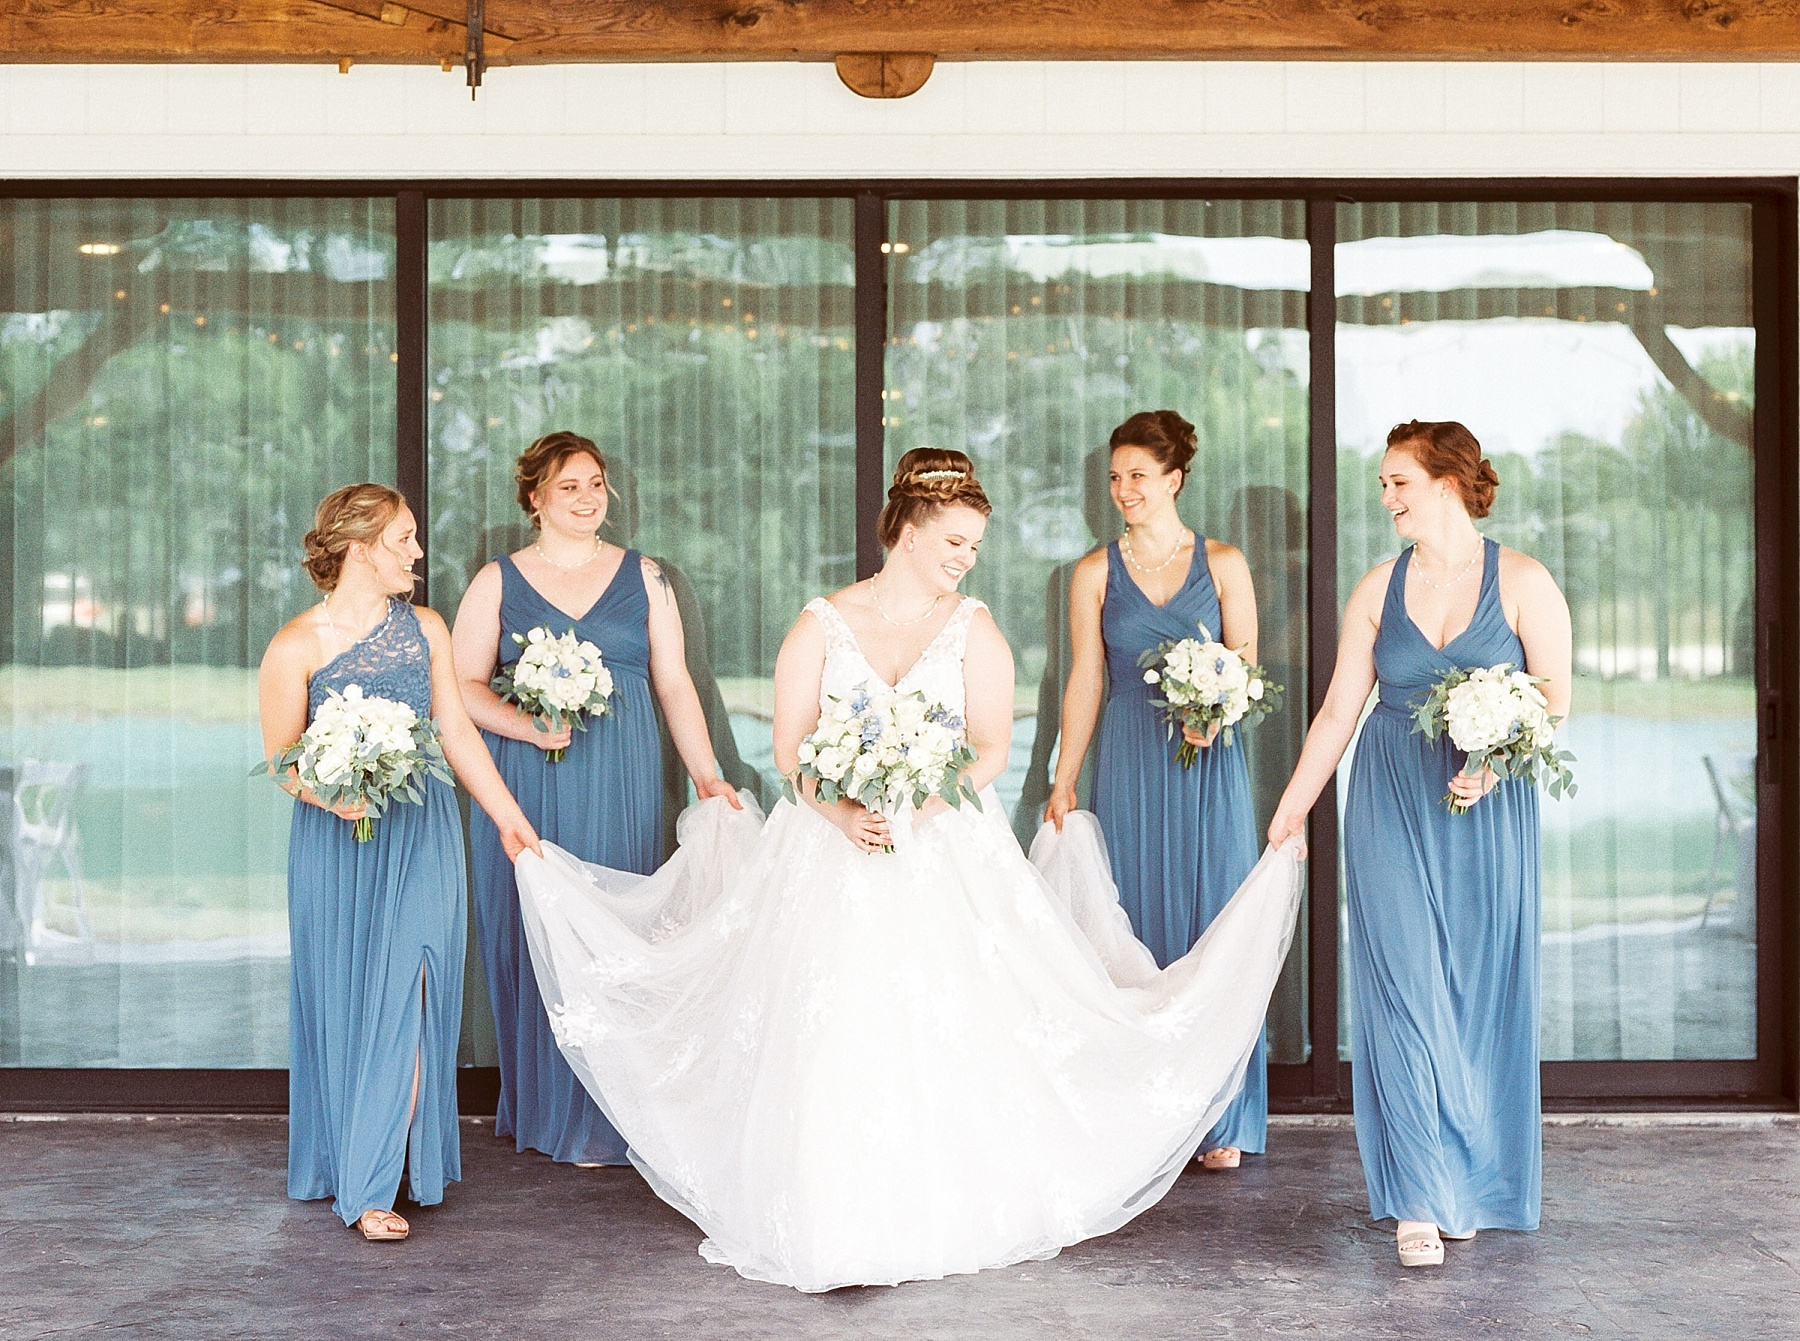 Intimate Summer Wedding at Emerson Fields by Kelsi Kliethermes Photography Best Missouri and Maui Wedding Photographer_0018.jpg